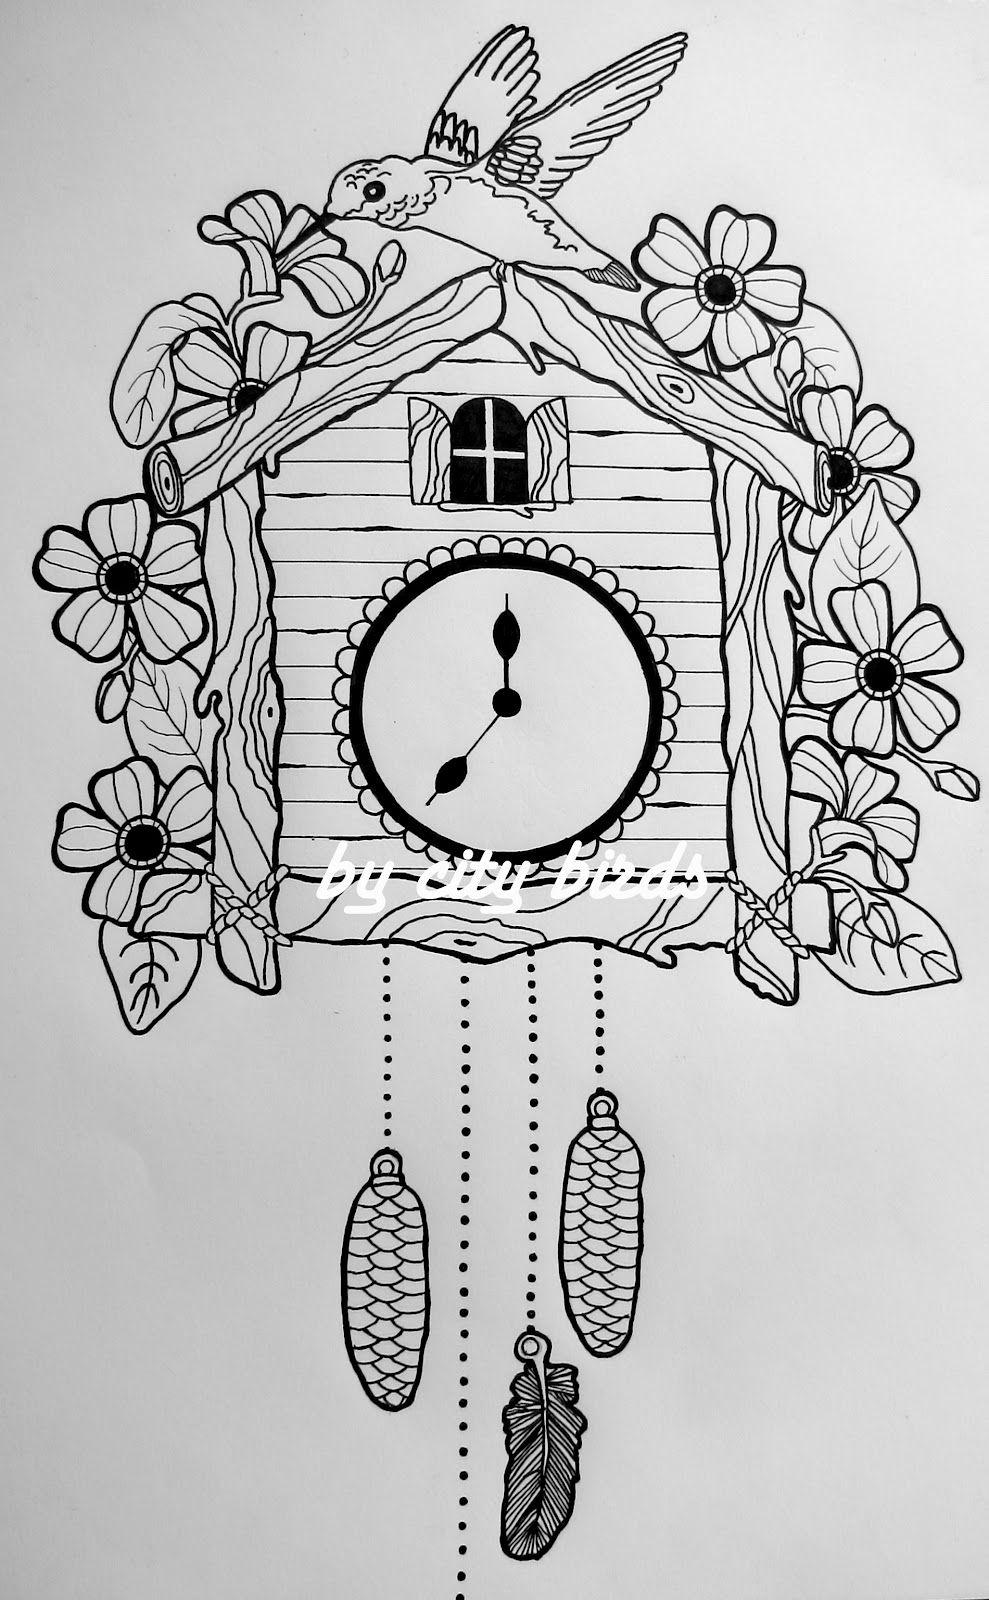 Cuckoo Bird Clock Tattoo Cuckooclock9 cuckoo clock  Tattoo uhr